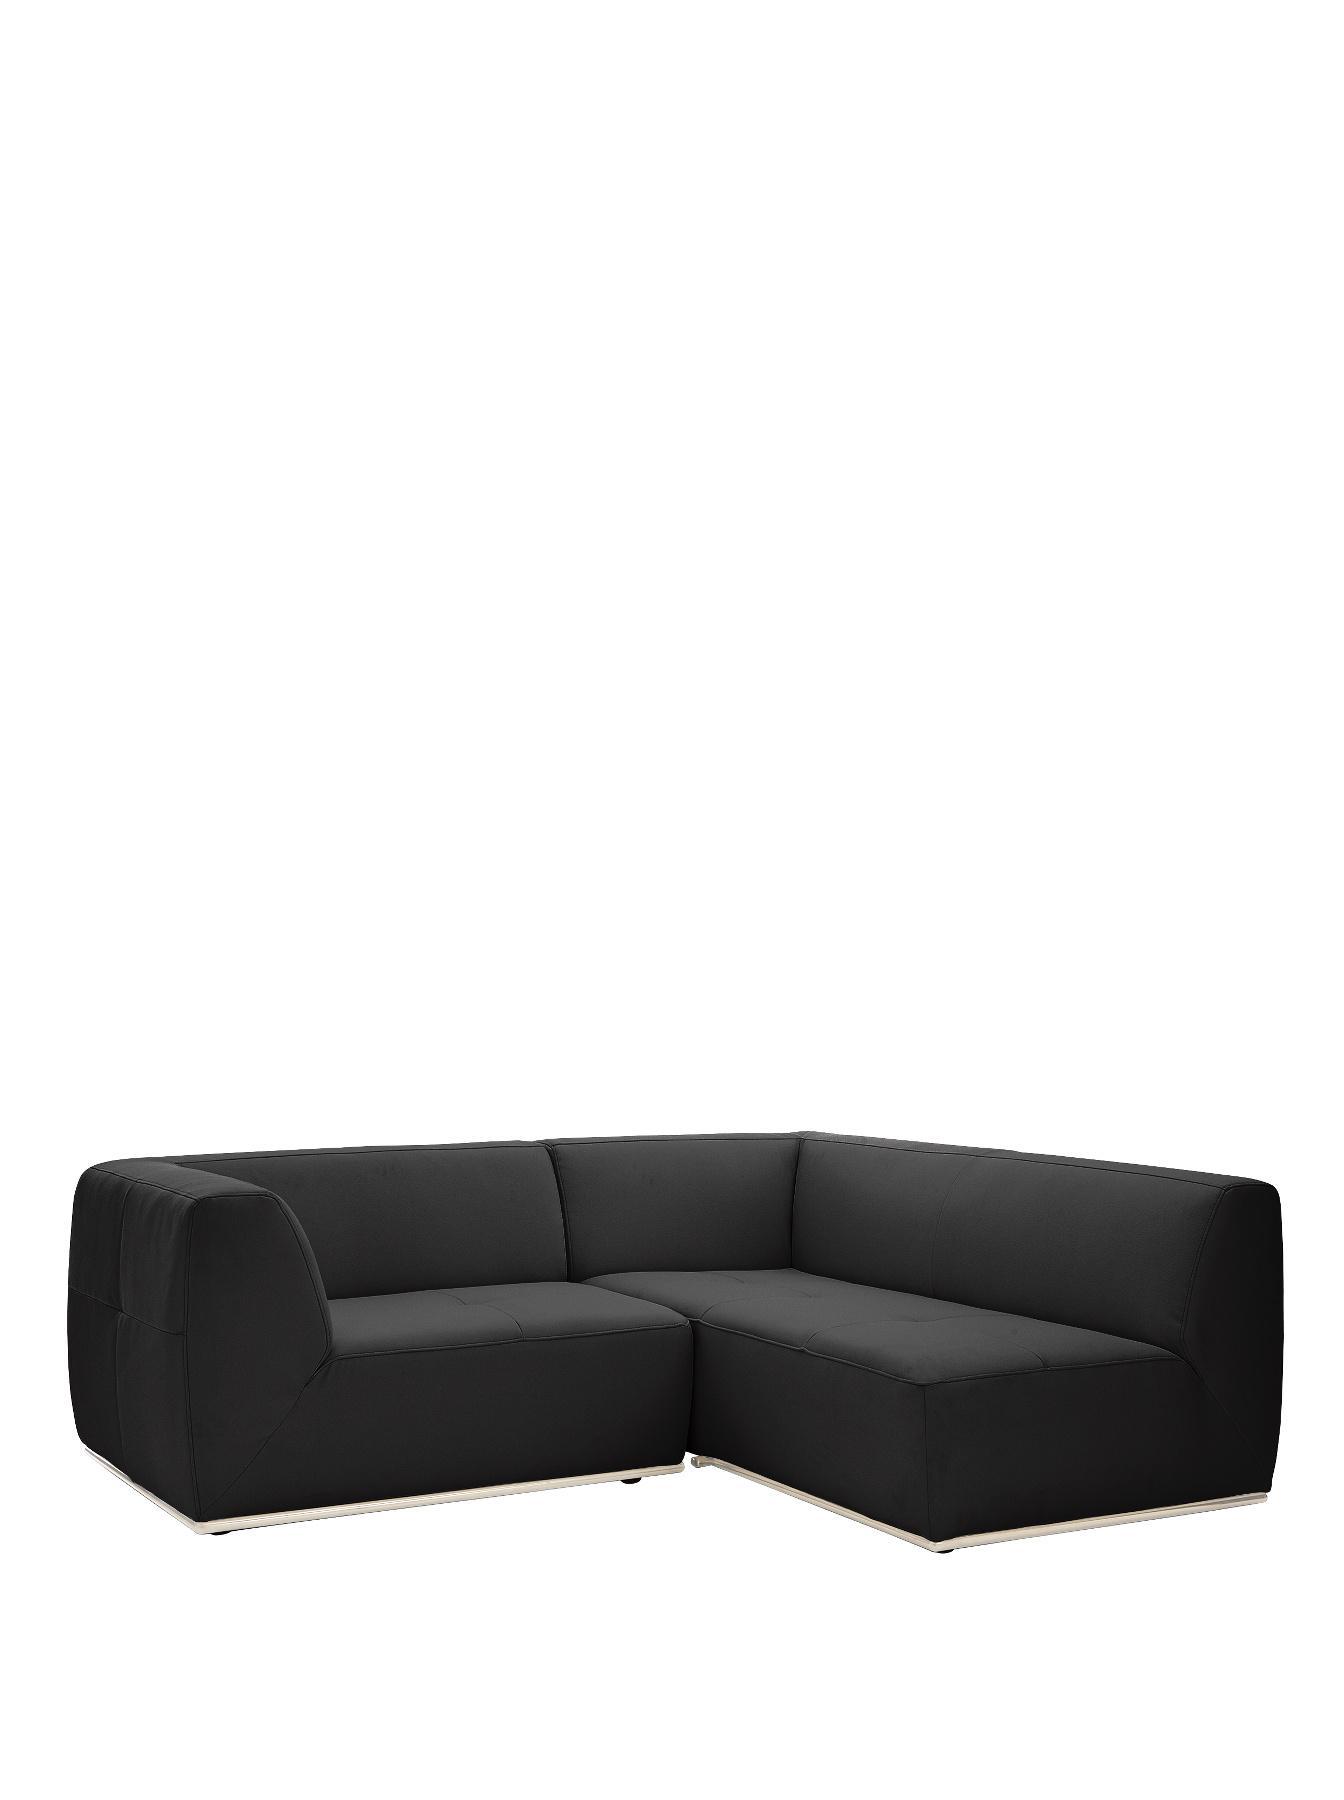 Boda Modular Regular Right Hand Faux Leather Corner Group Sofa BlackWhite